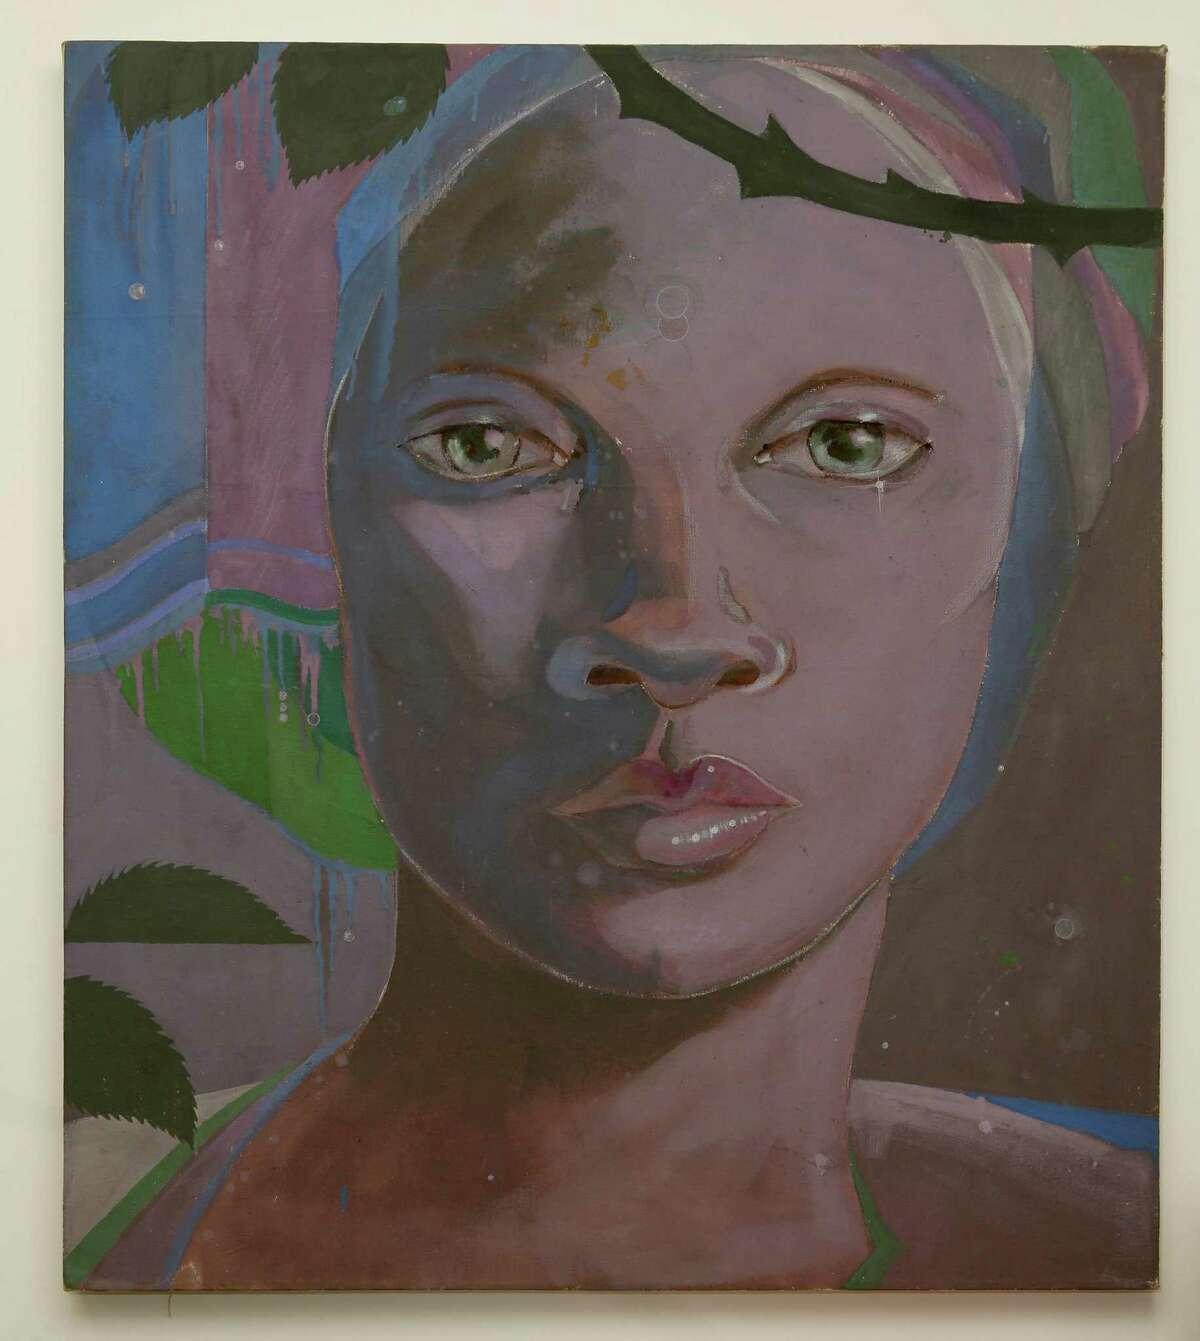 FAVORITE ARTWORK: A painting by Anastasia Sams